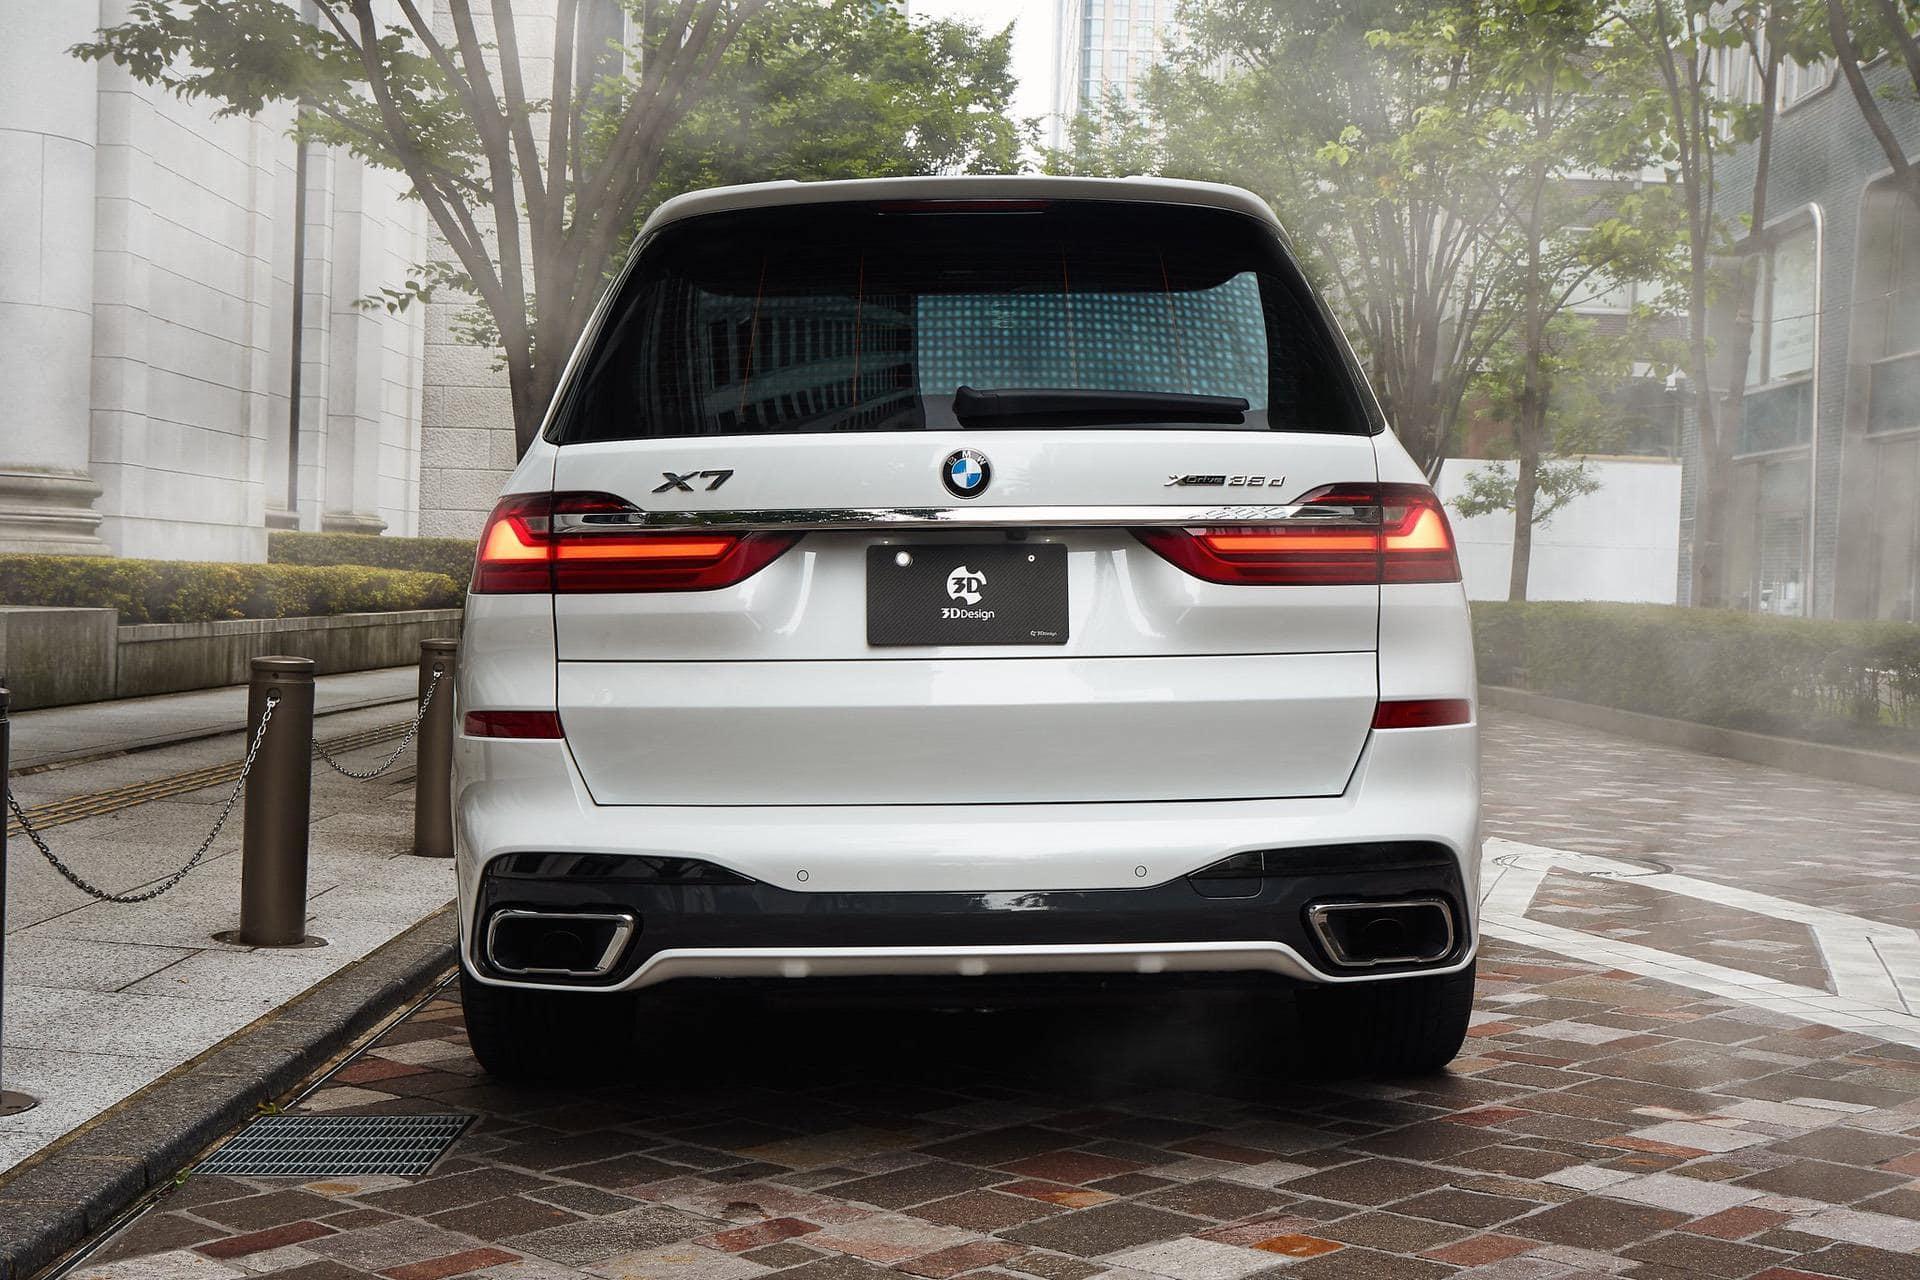 BMW-X7-by-3D-Design-9